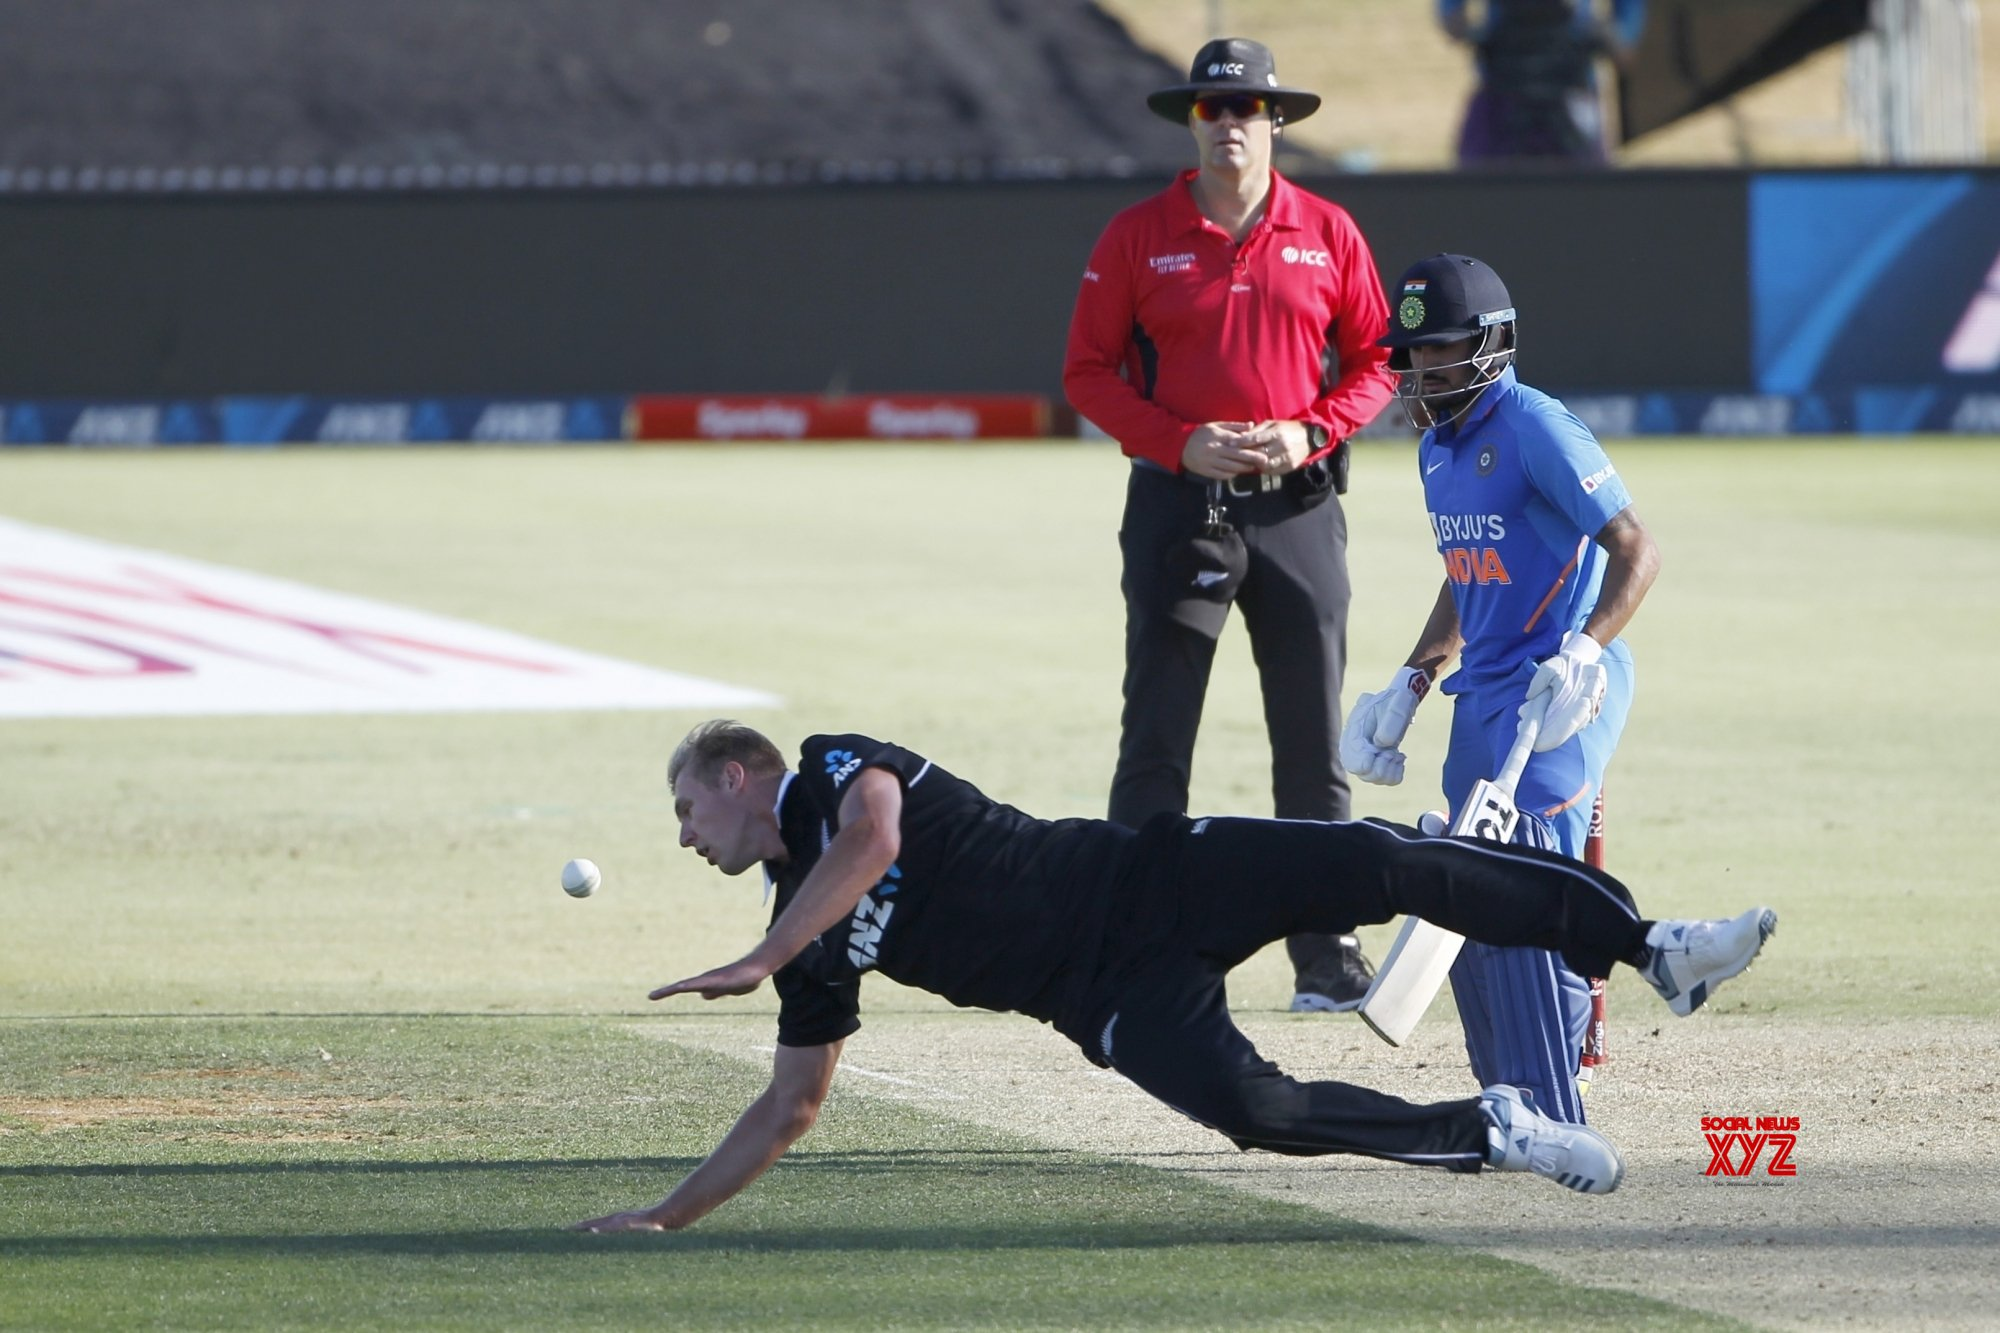 Mount Maunganui: 3rd ODI - India Vs New Zealand (Batch - 7) #Gallery